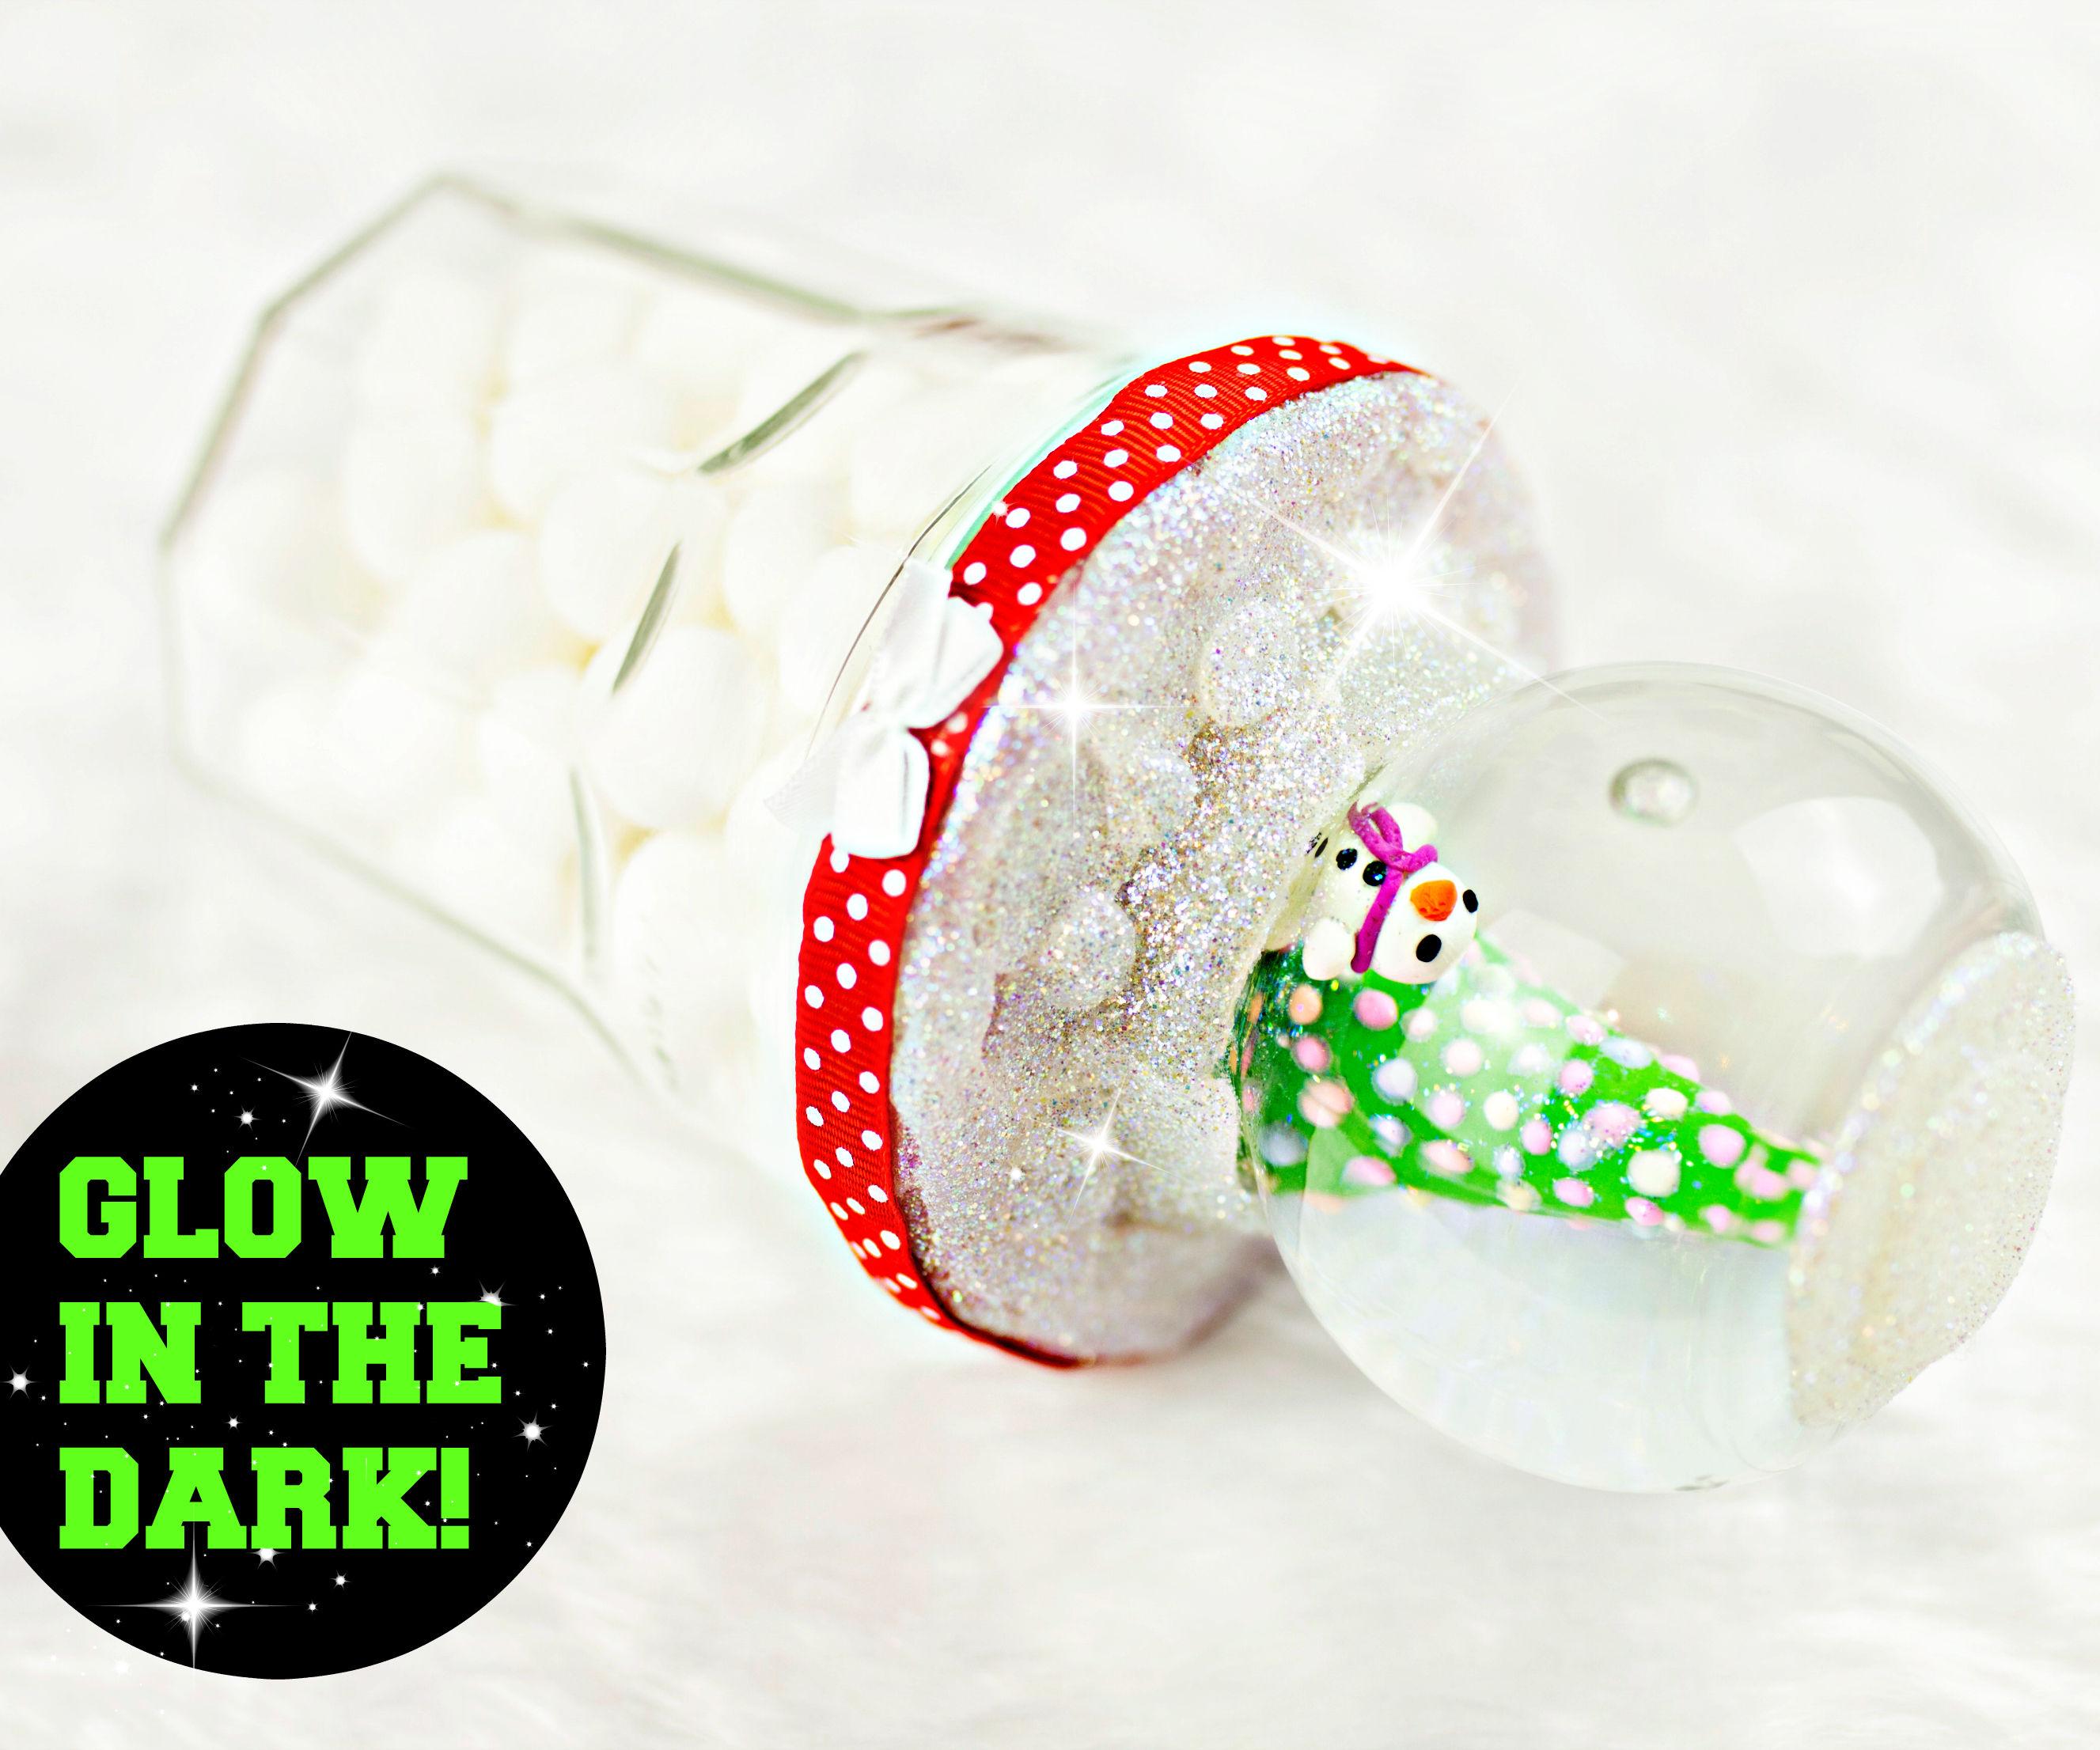 DIY Snow Globe Jar - Glow in the dark!